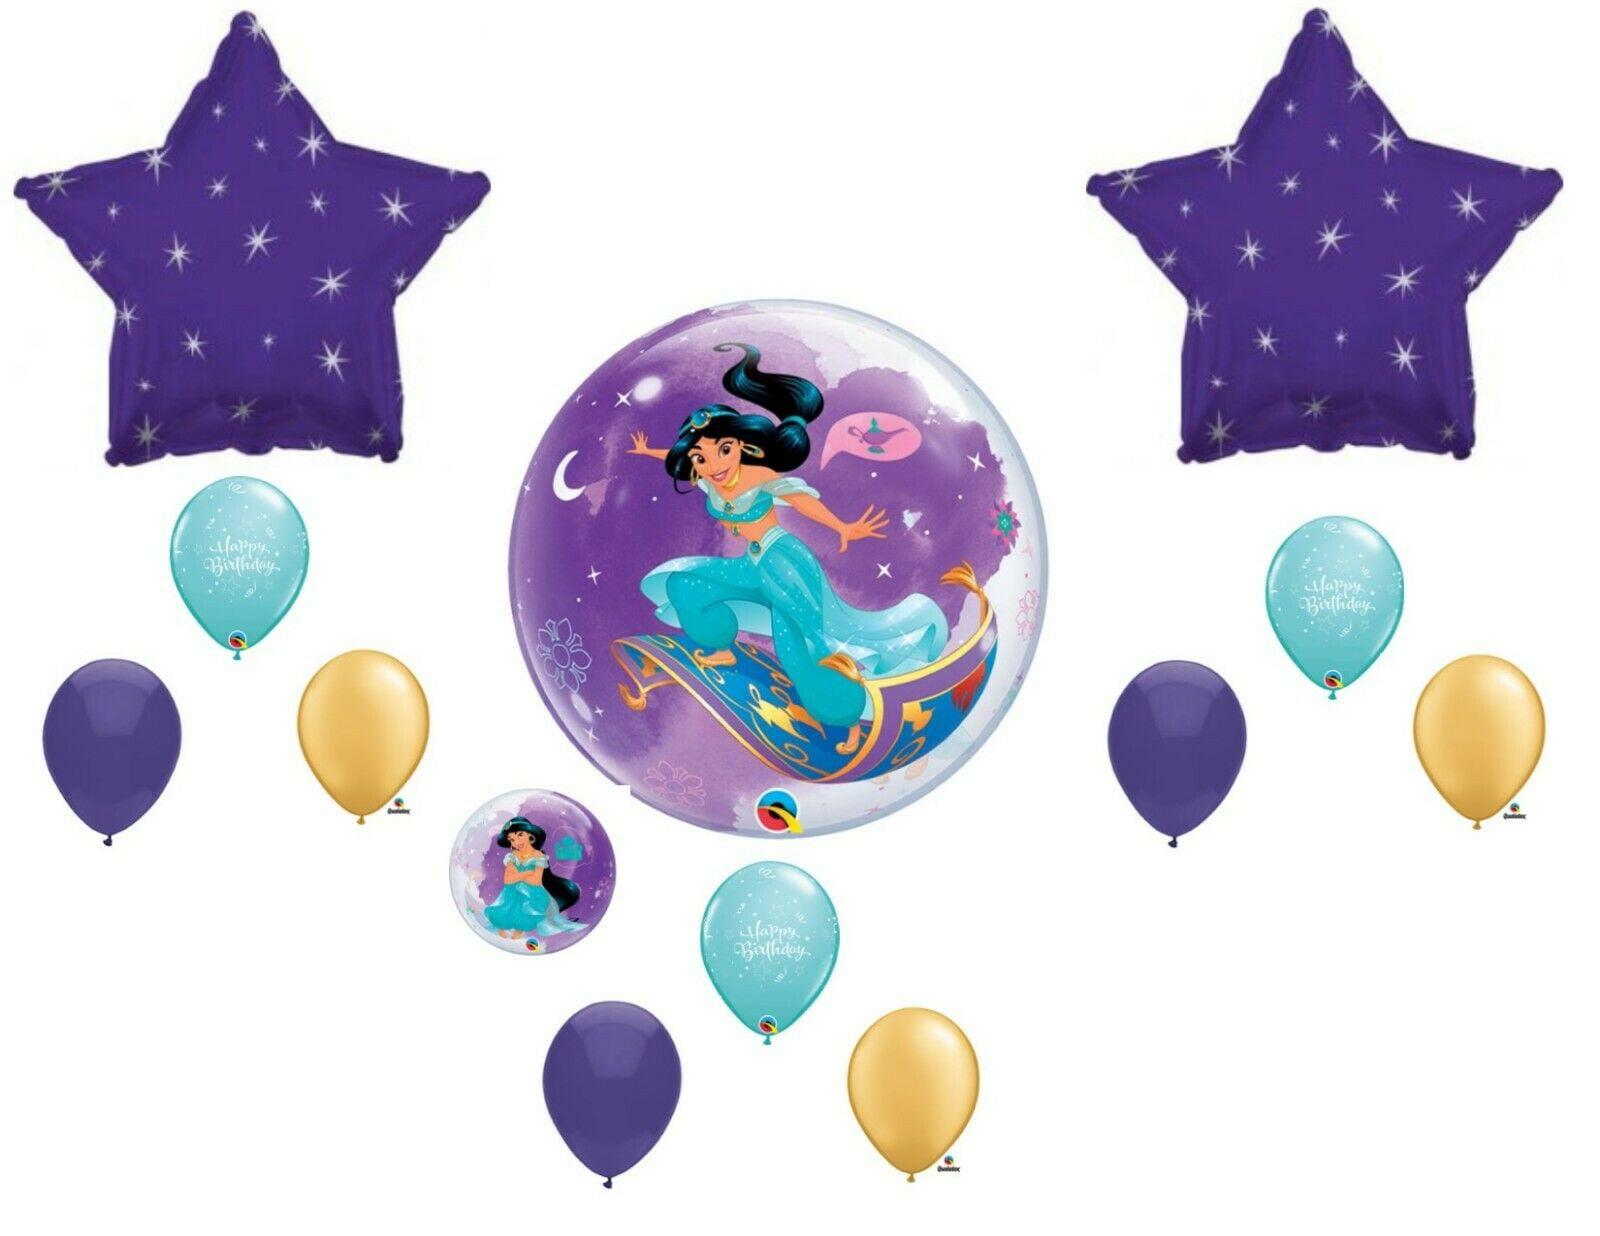 Princess Jasmine Birthday Party Decorations  from i5.walmartimages.com